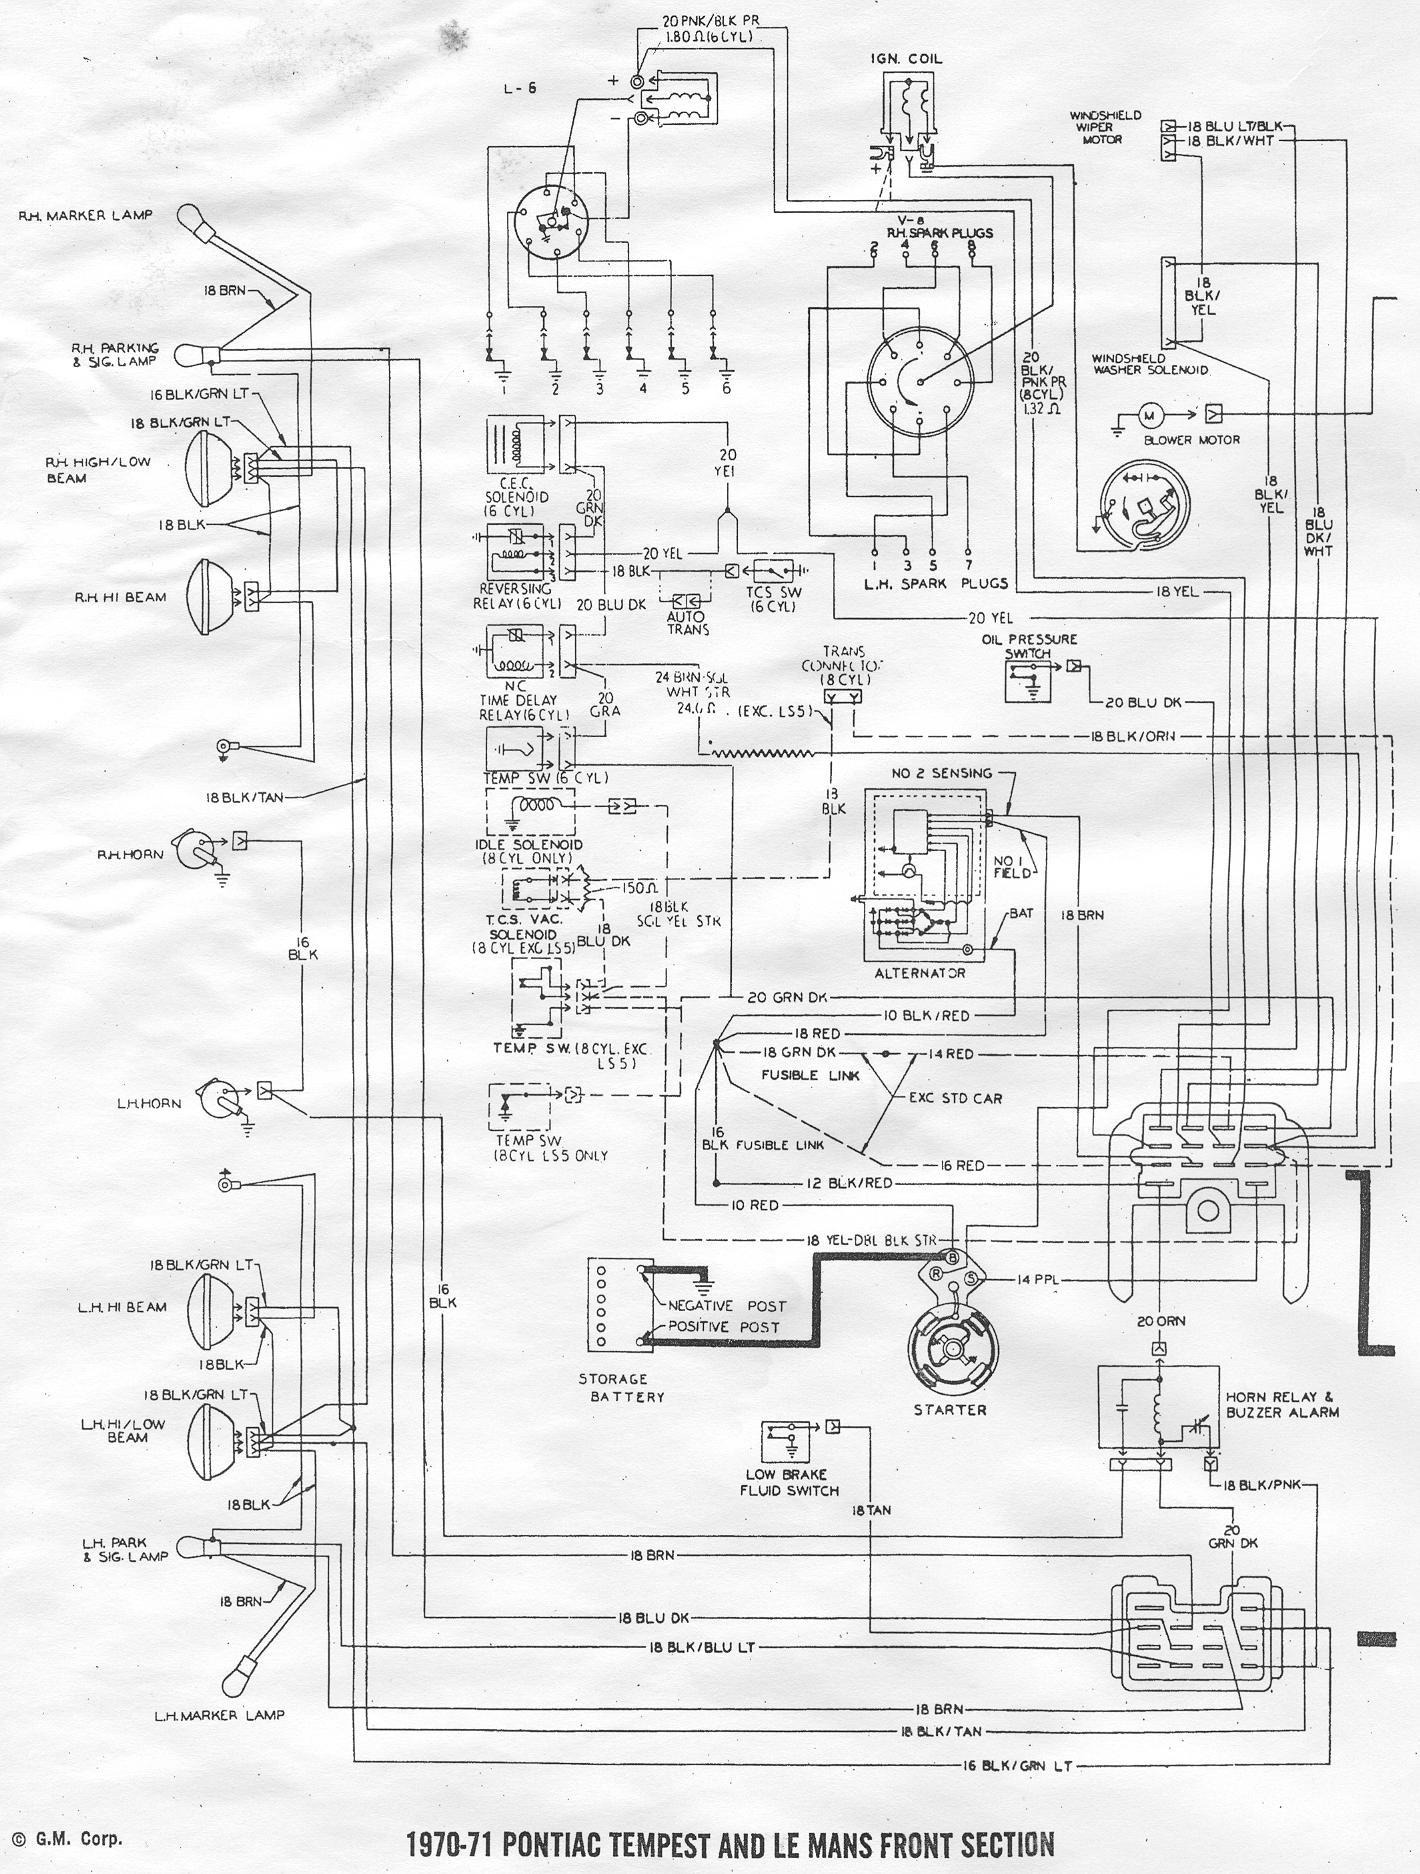 2004 Gto Alternator Wiring Diagram